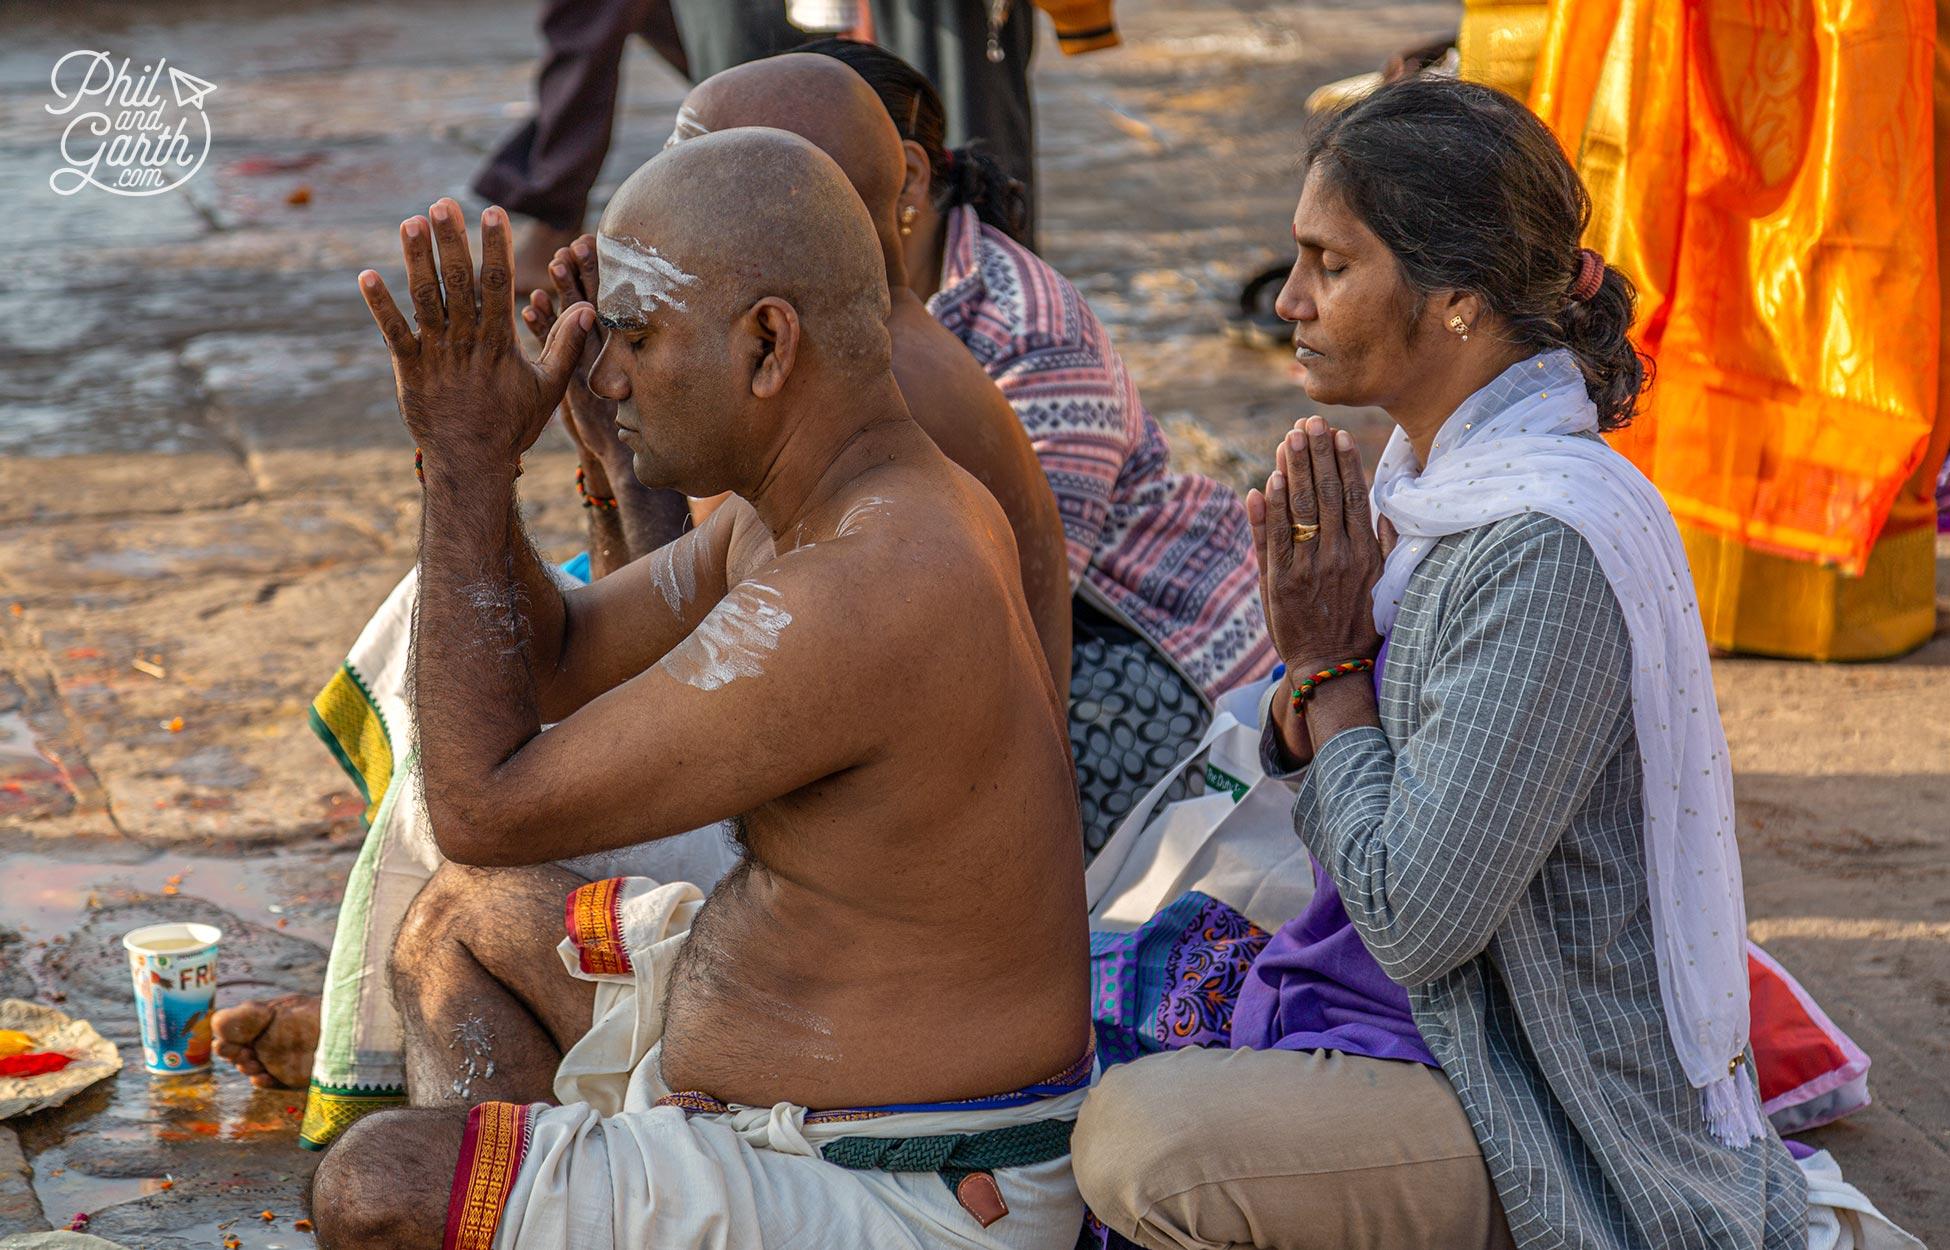 Over2.5 million Hindu pilgrims will visit Varanasi every year